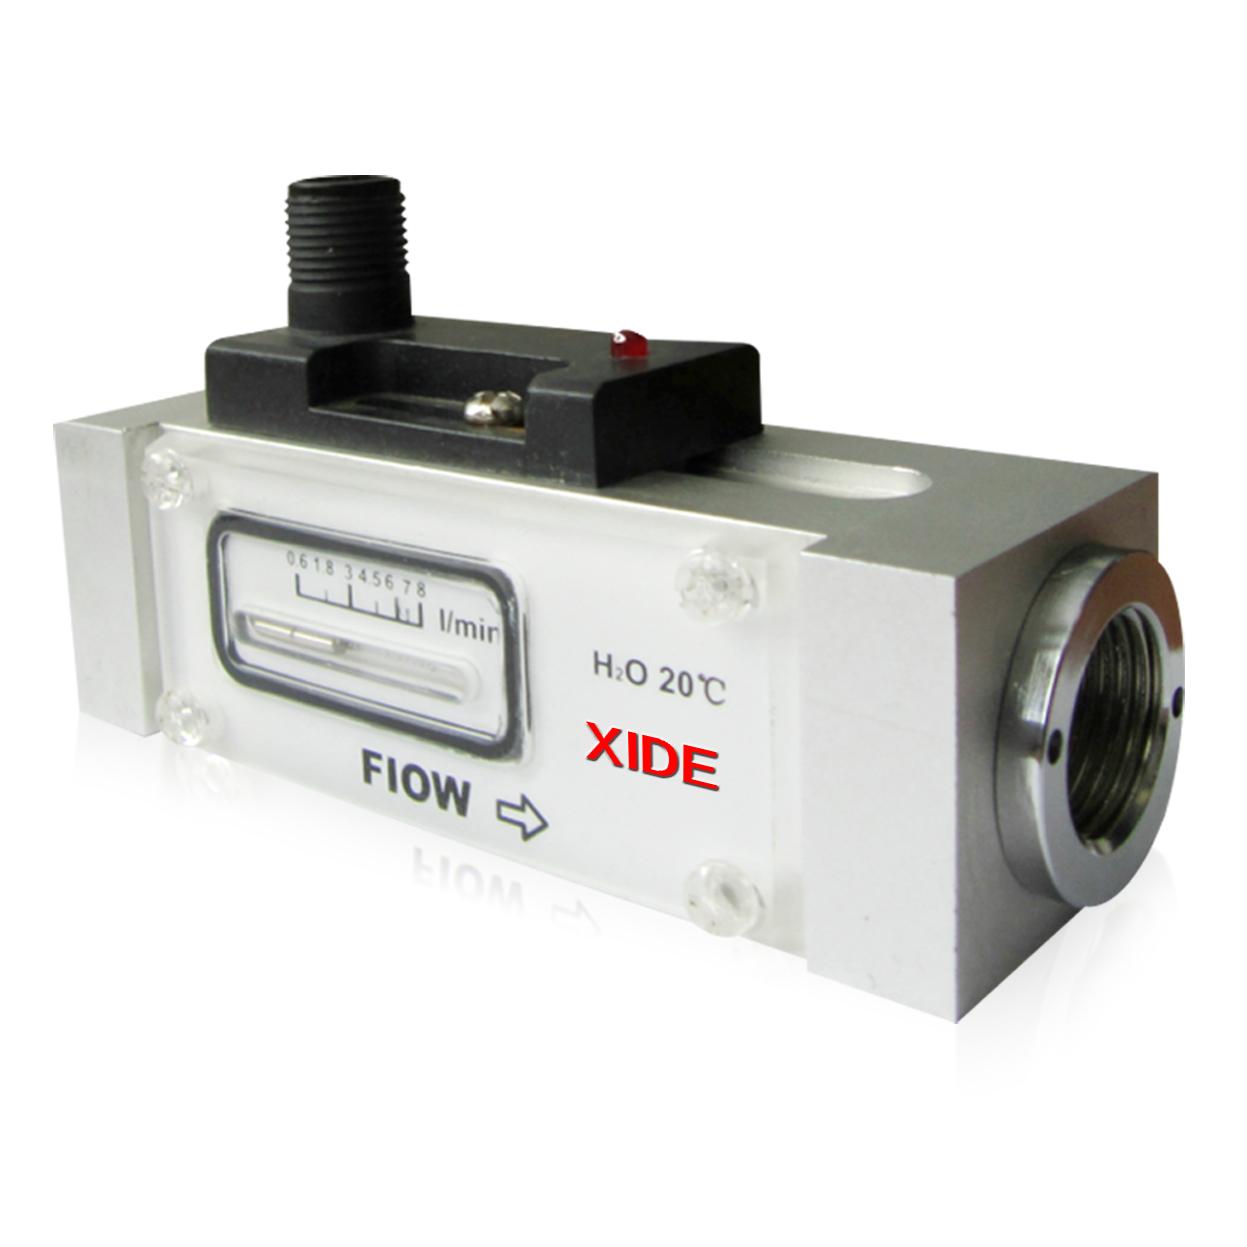 ★04FE40气液活塞式显示流量开关定制版XIDE新西德传感器电子设备制造厂@流量显示开关